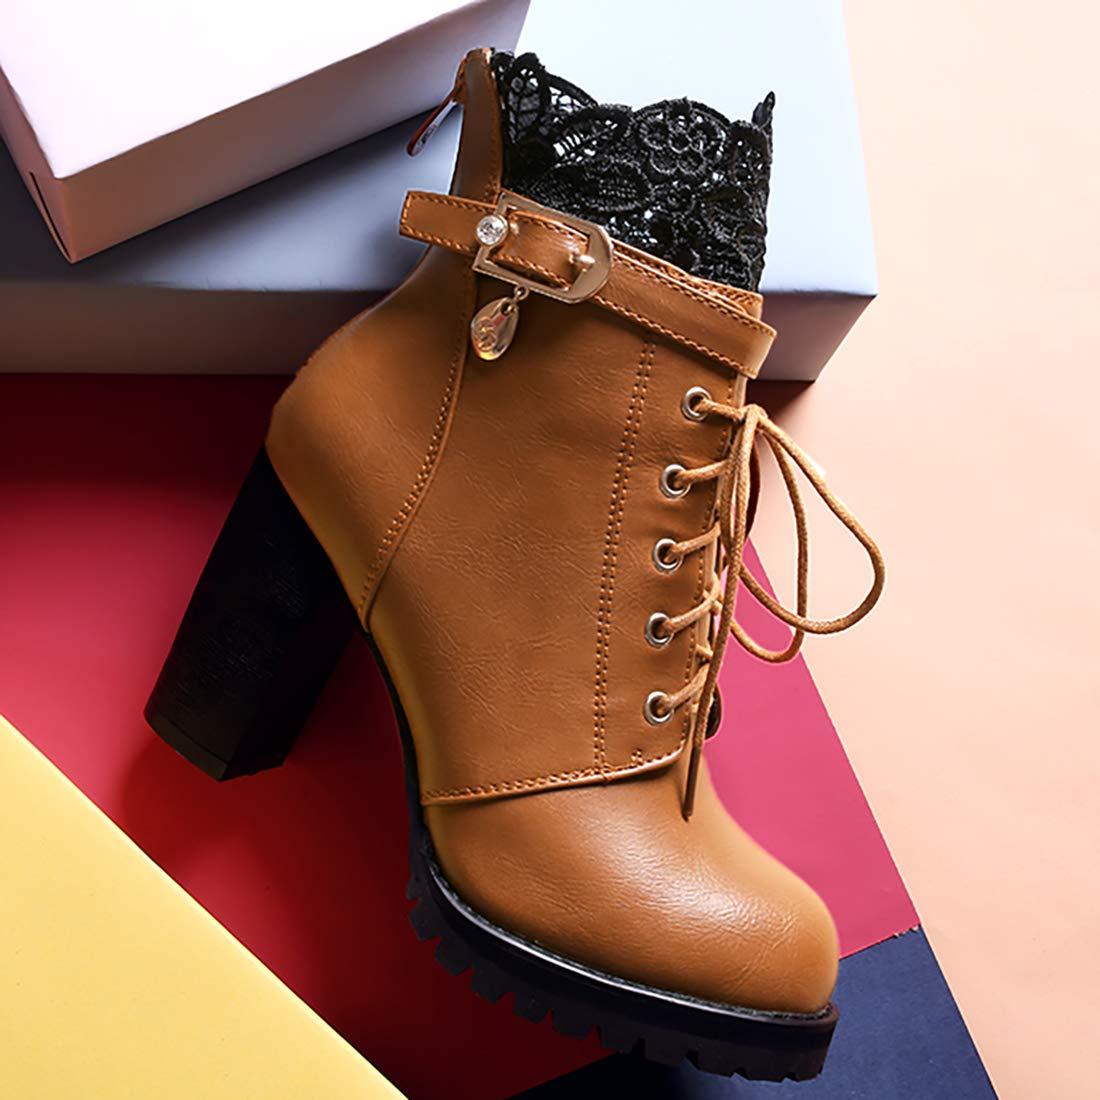 Vitalo Womens Block High Heel Platform Lace Up Buckle Ankle Boots Autumn Winter Booties